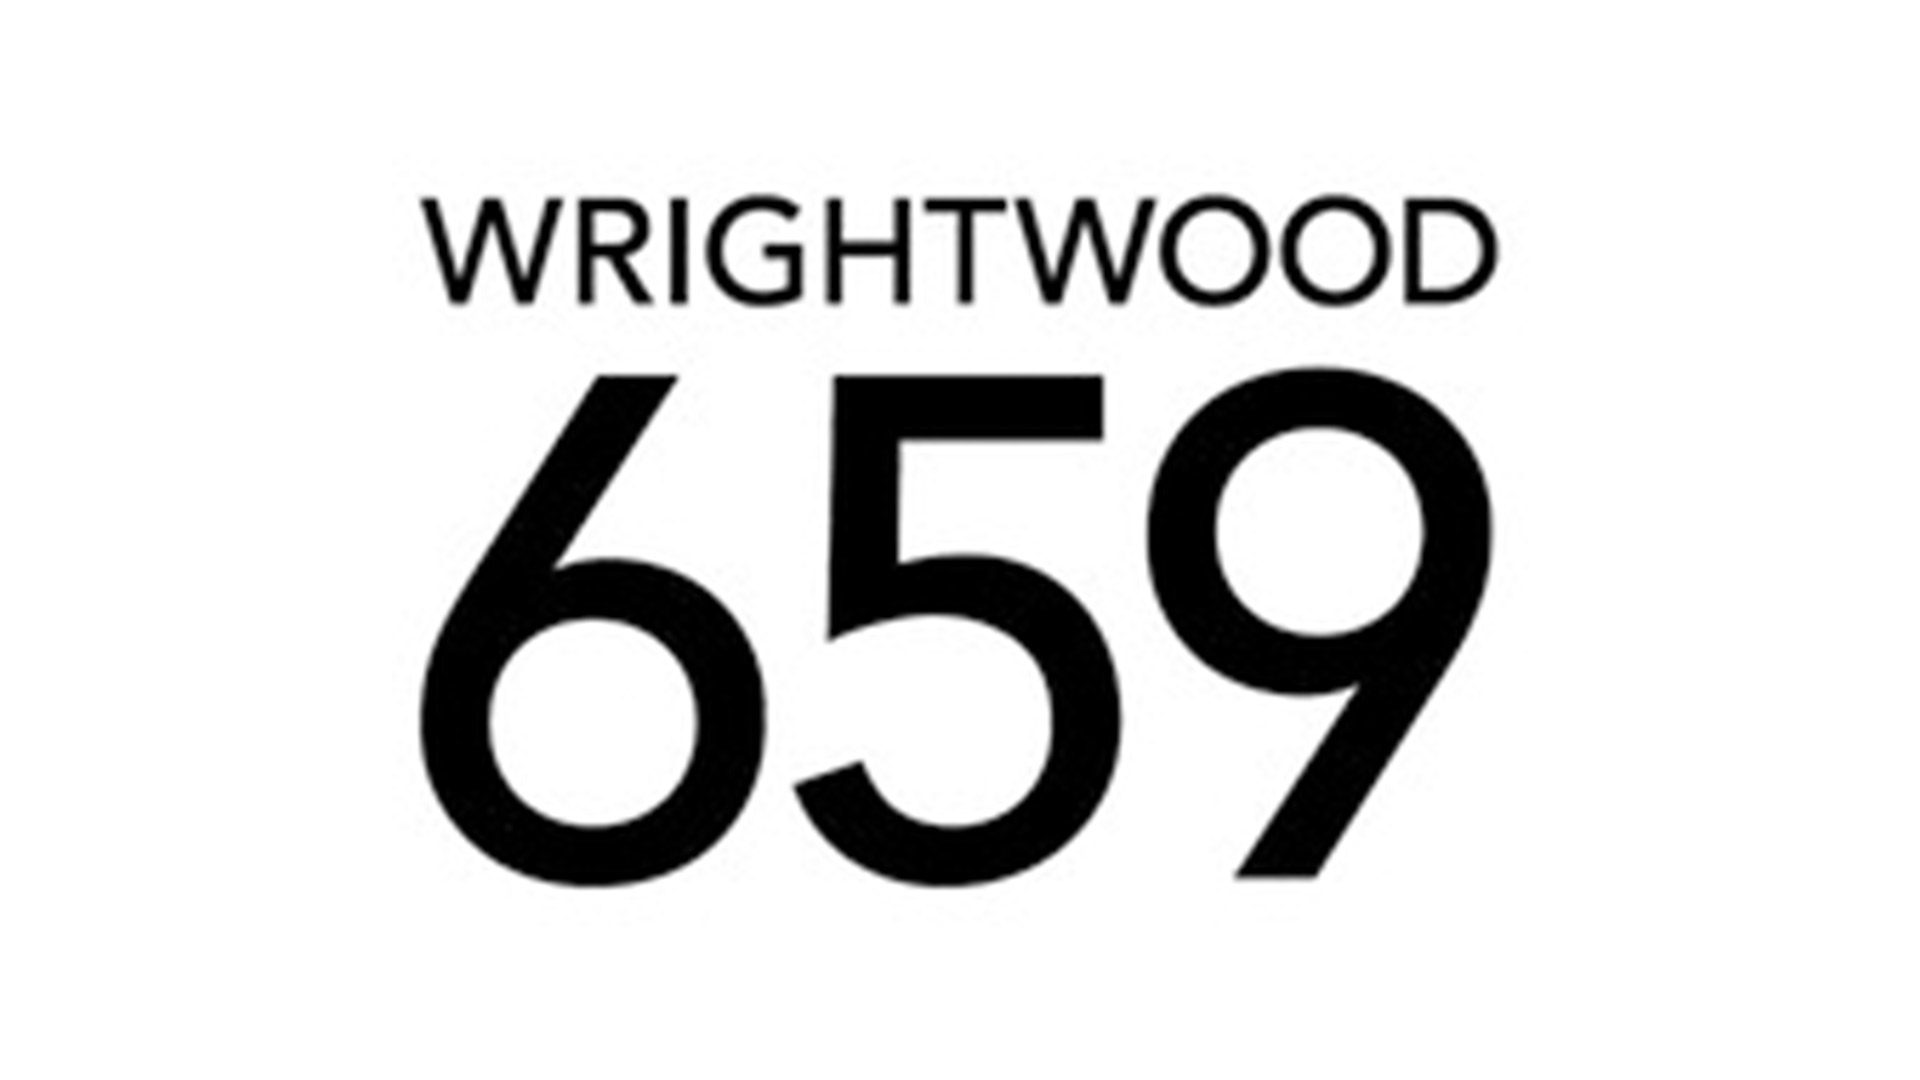 Wrightwood 659